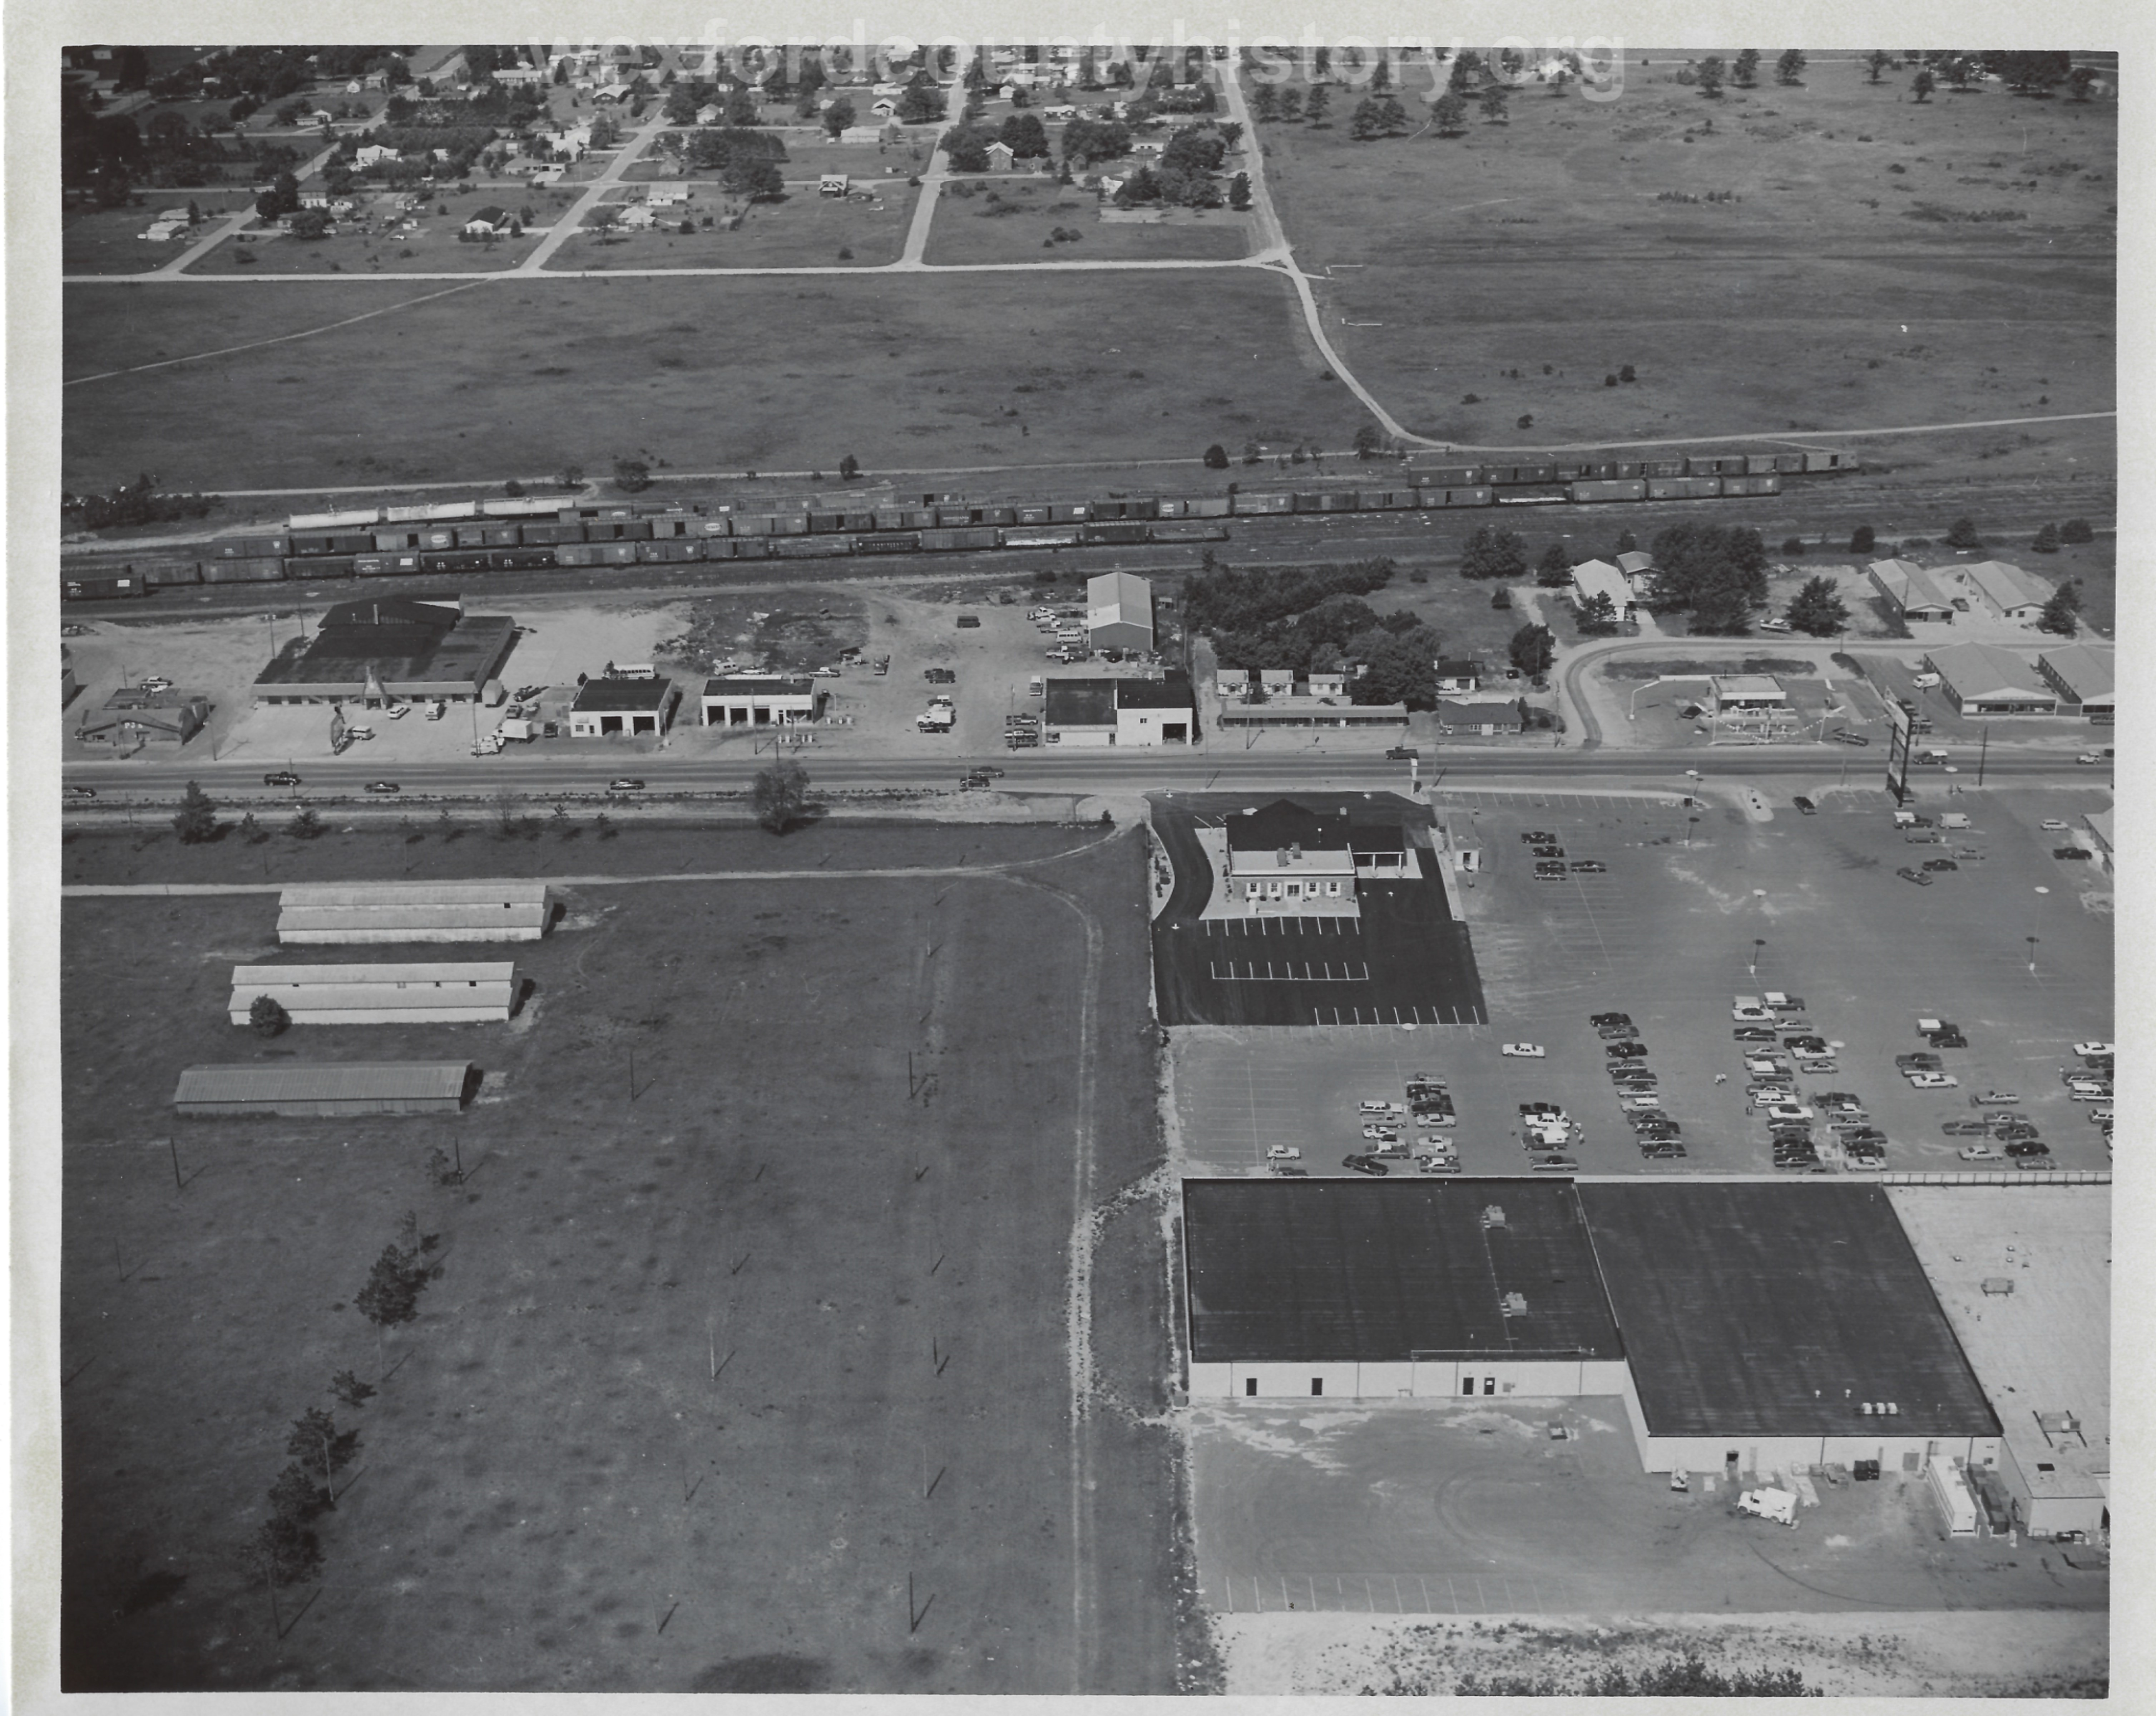 Former K-Mart Plaza and Northern District Fairgrounds